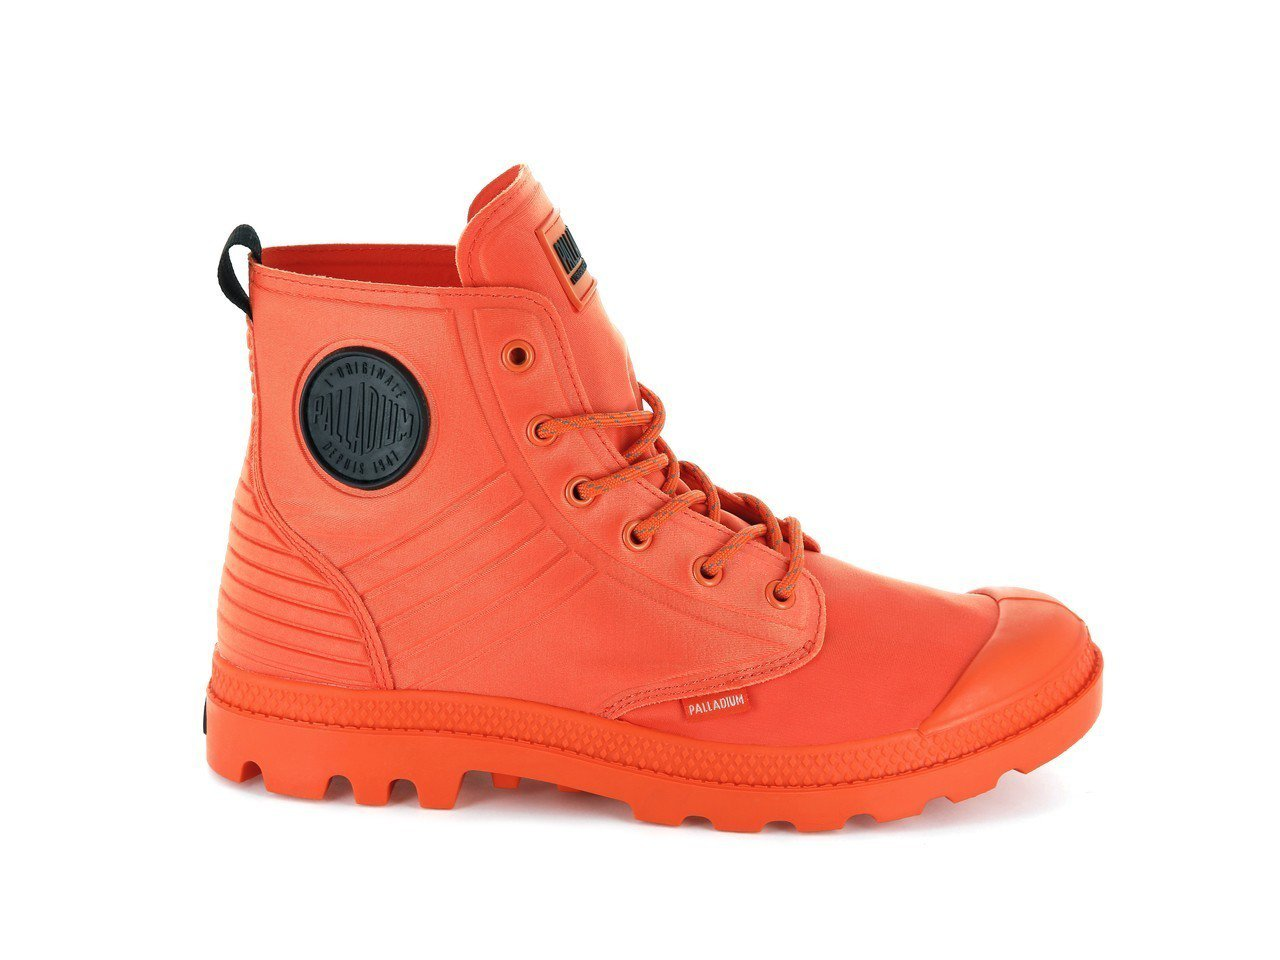 PALLADIUM PAMPA Amphibian空軍橘軍靴,2,880元。圖/...